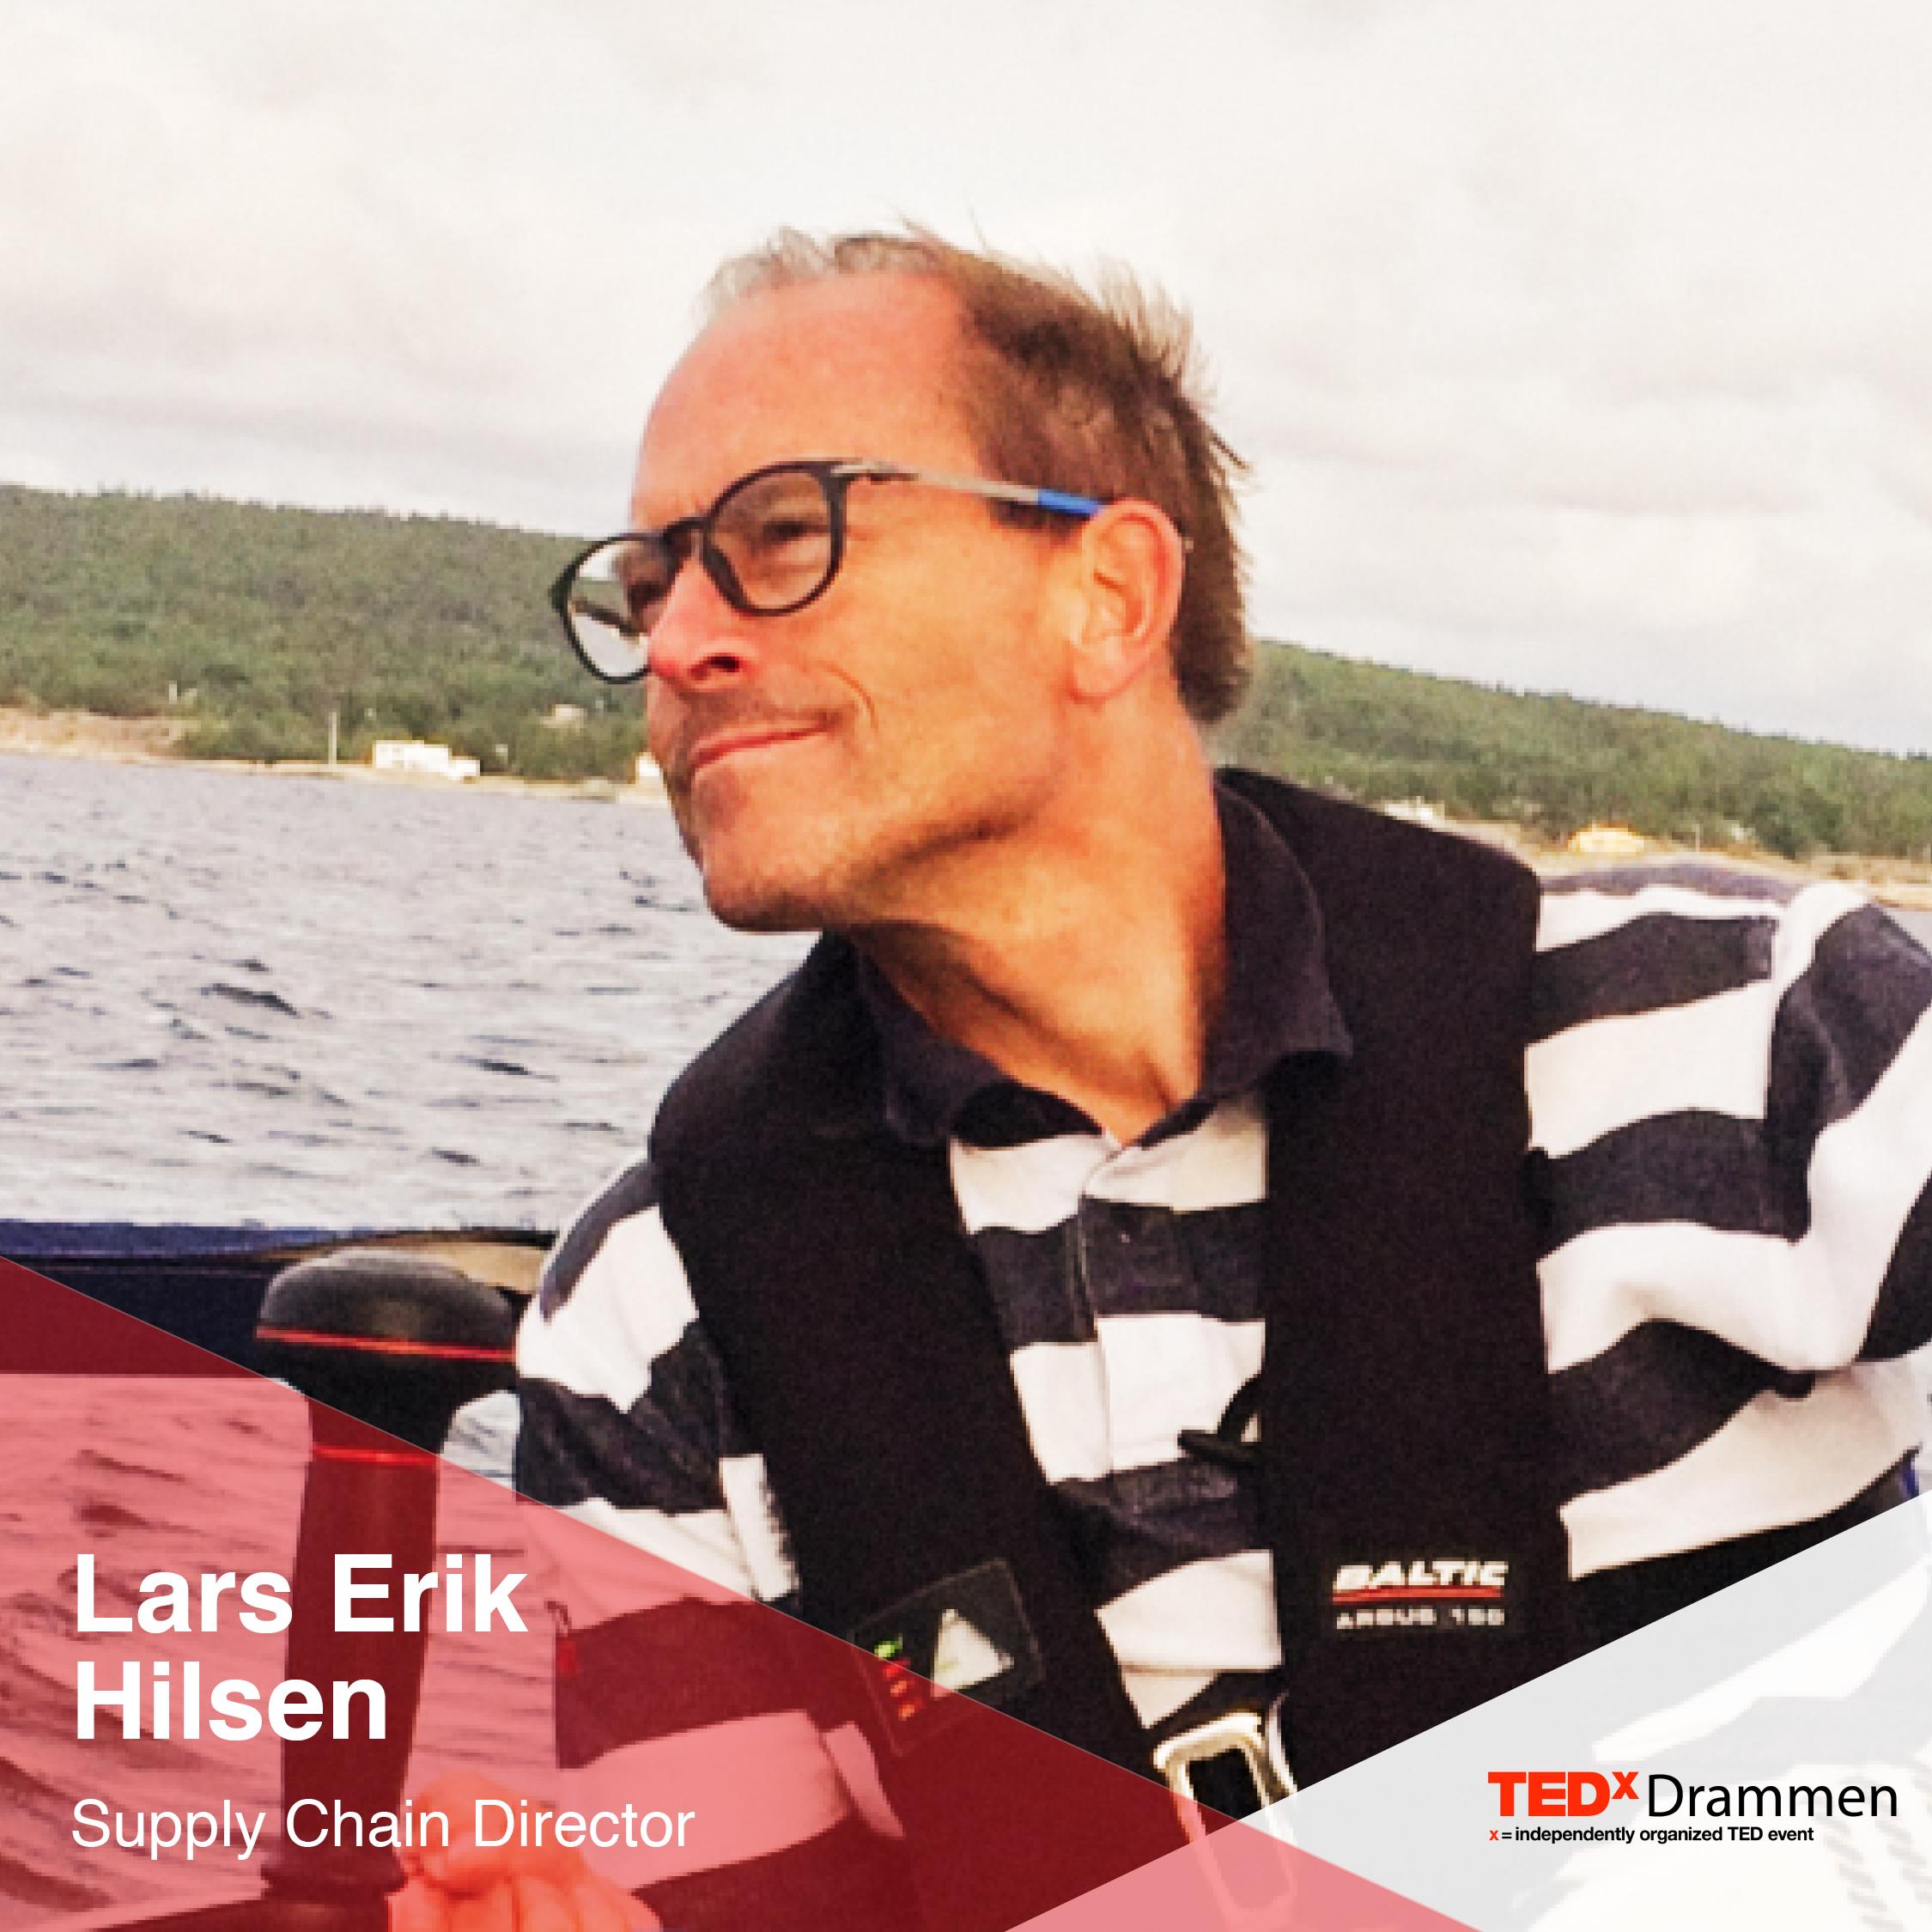 Lars Erik Hilsen